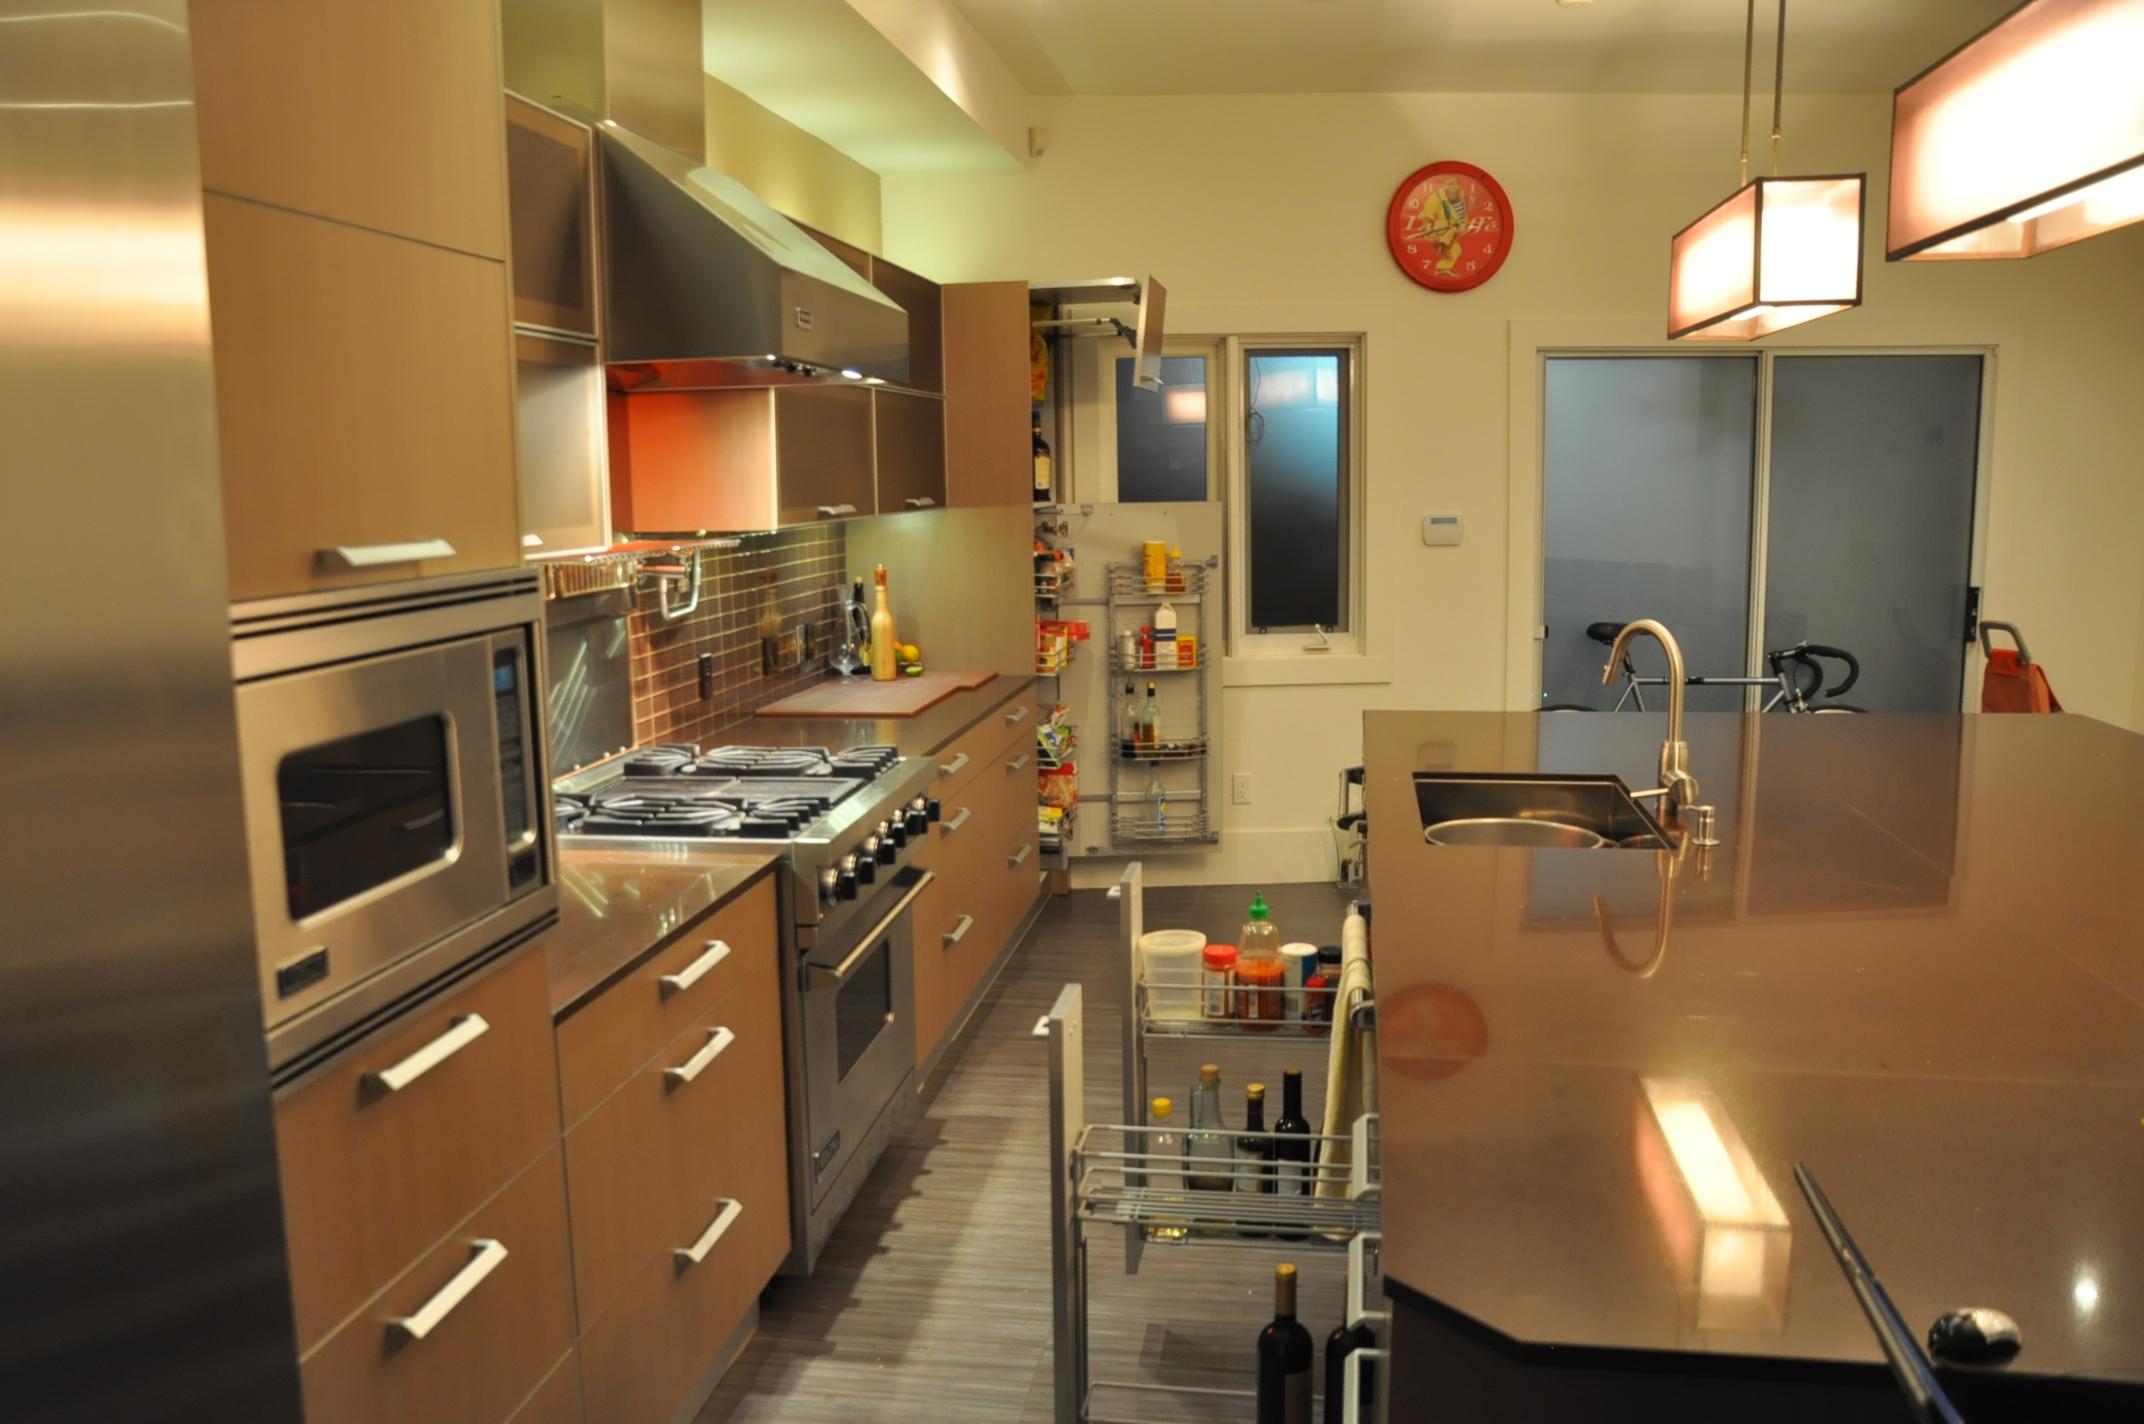 Kitchen 10 Pic 3.jpg